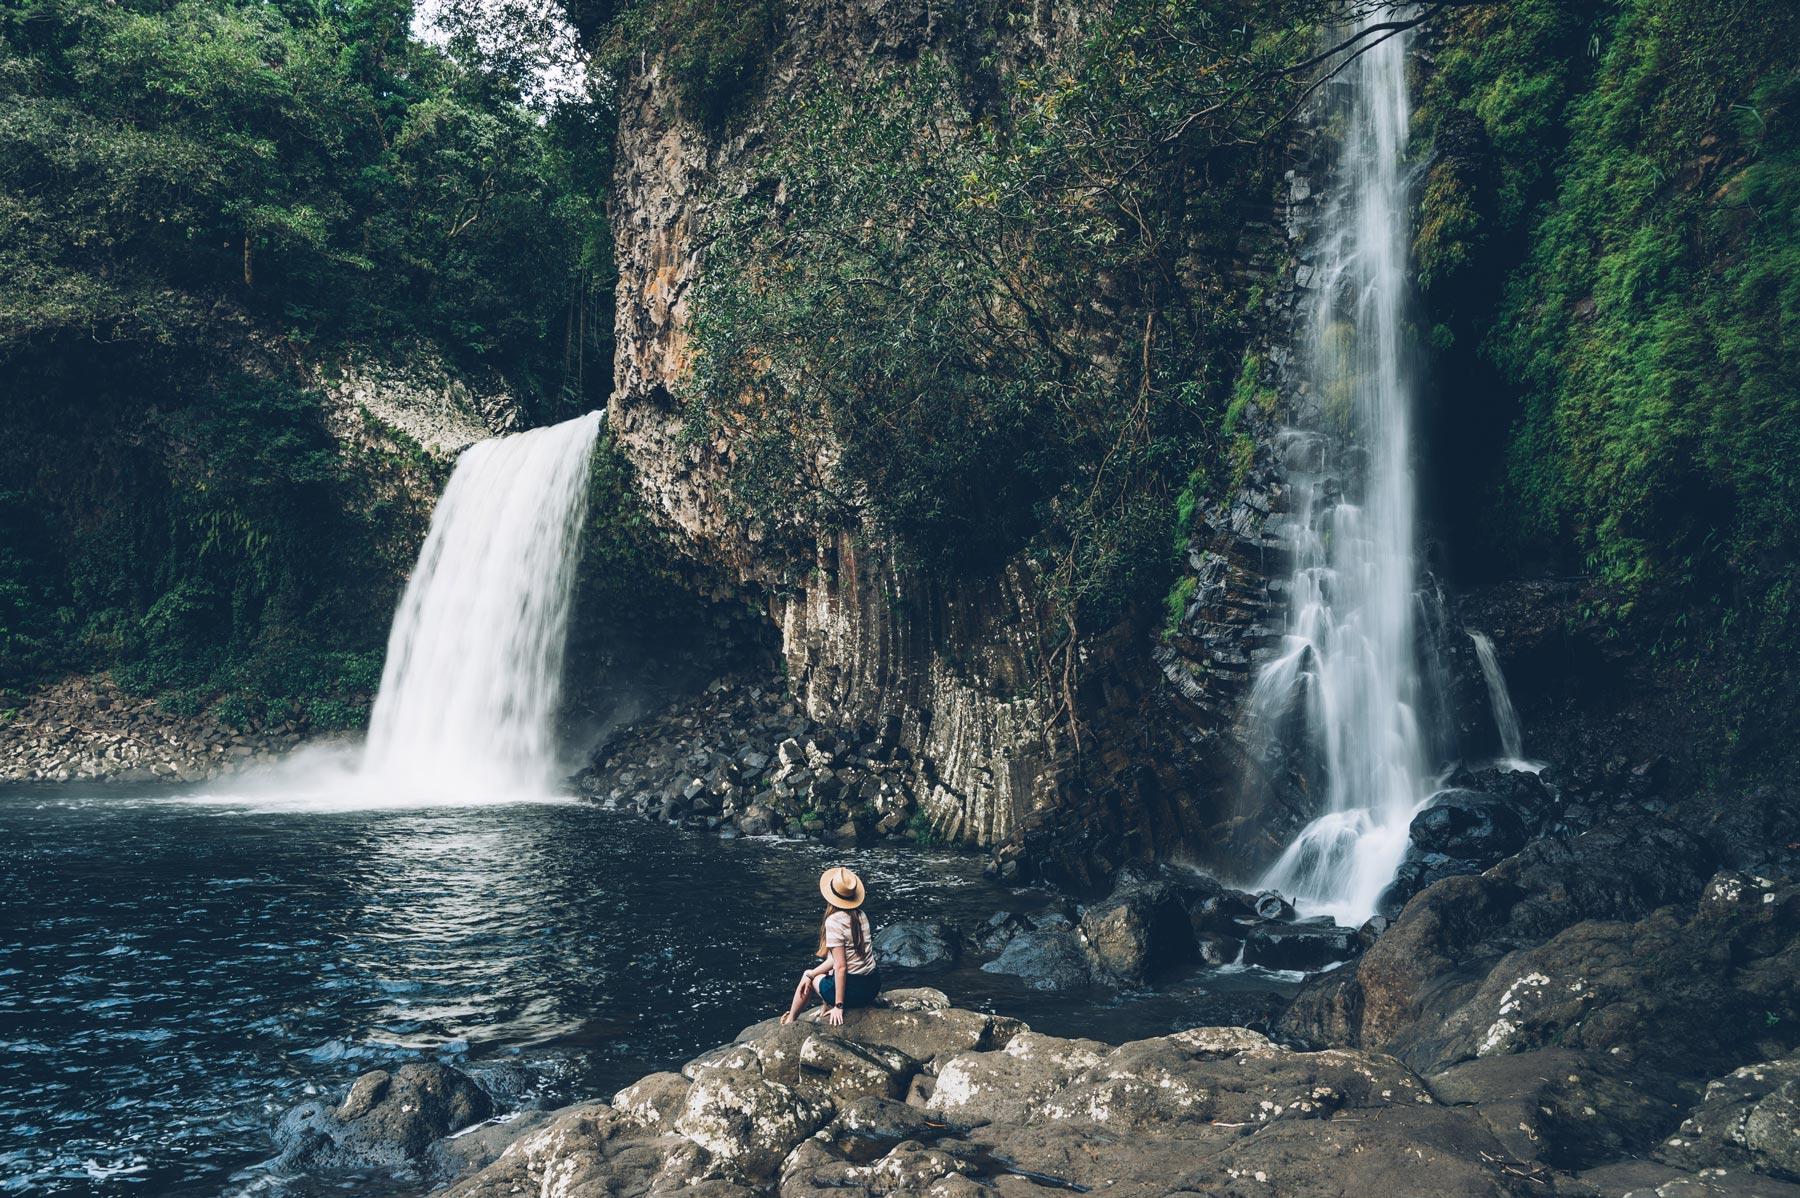 Cascade bassin La Paix, Réunion